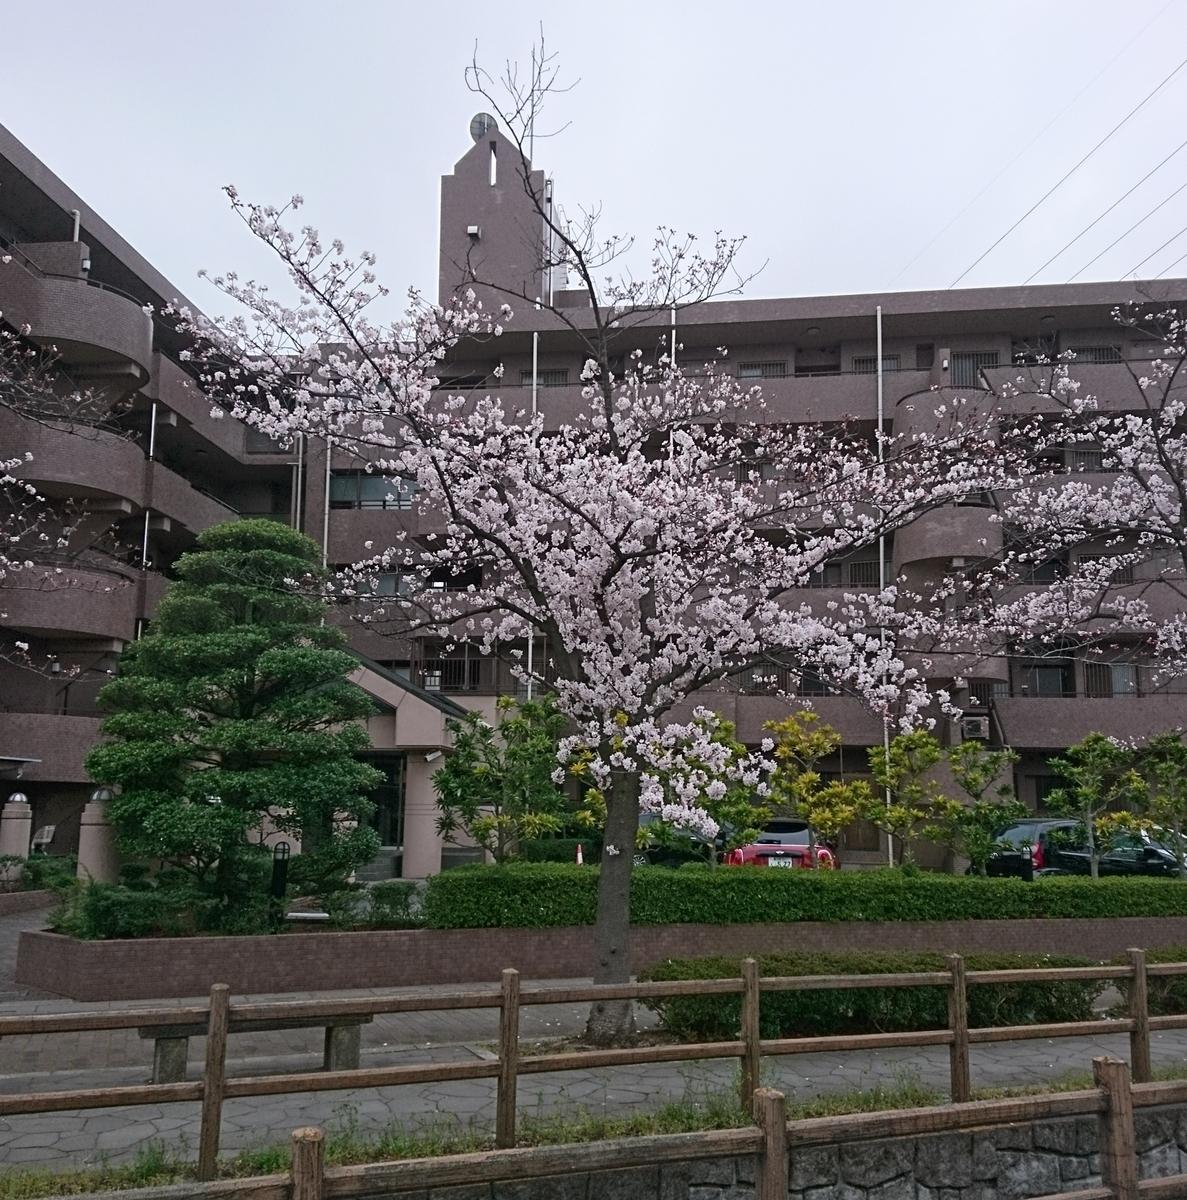 f:id:yokosuka206rc:20190330014943j:plain